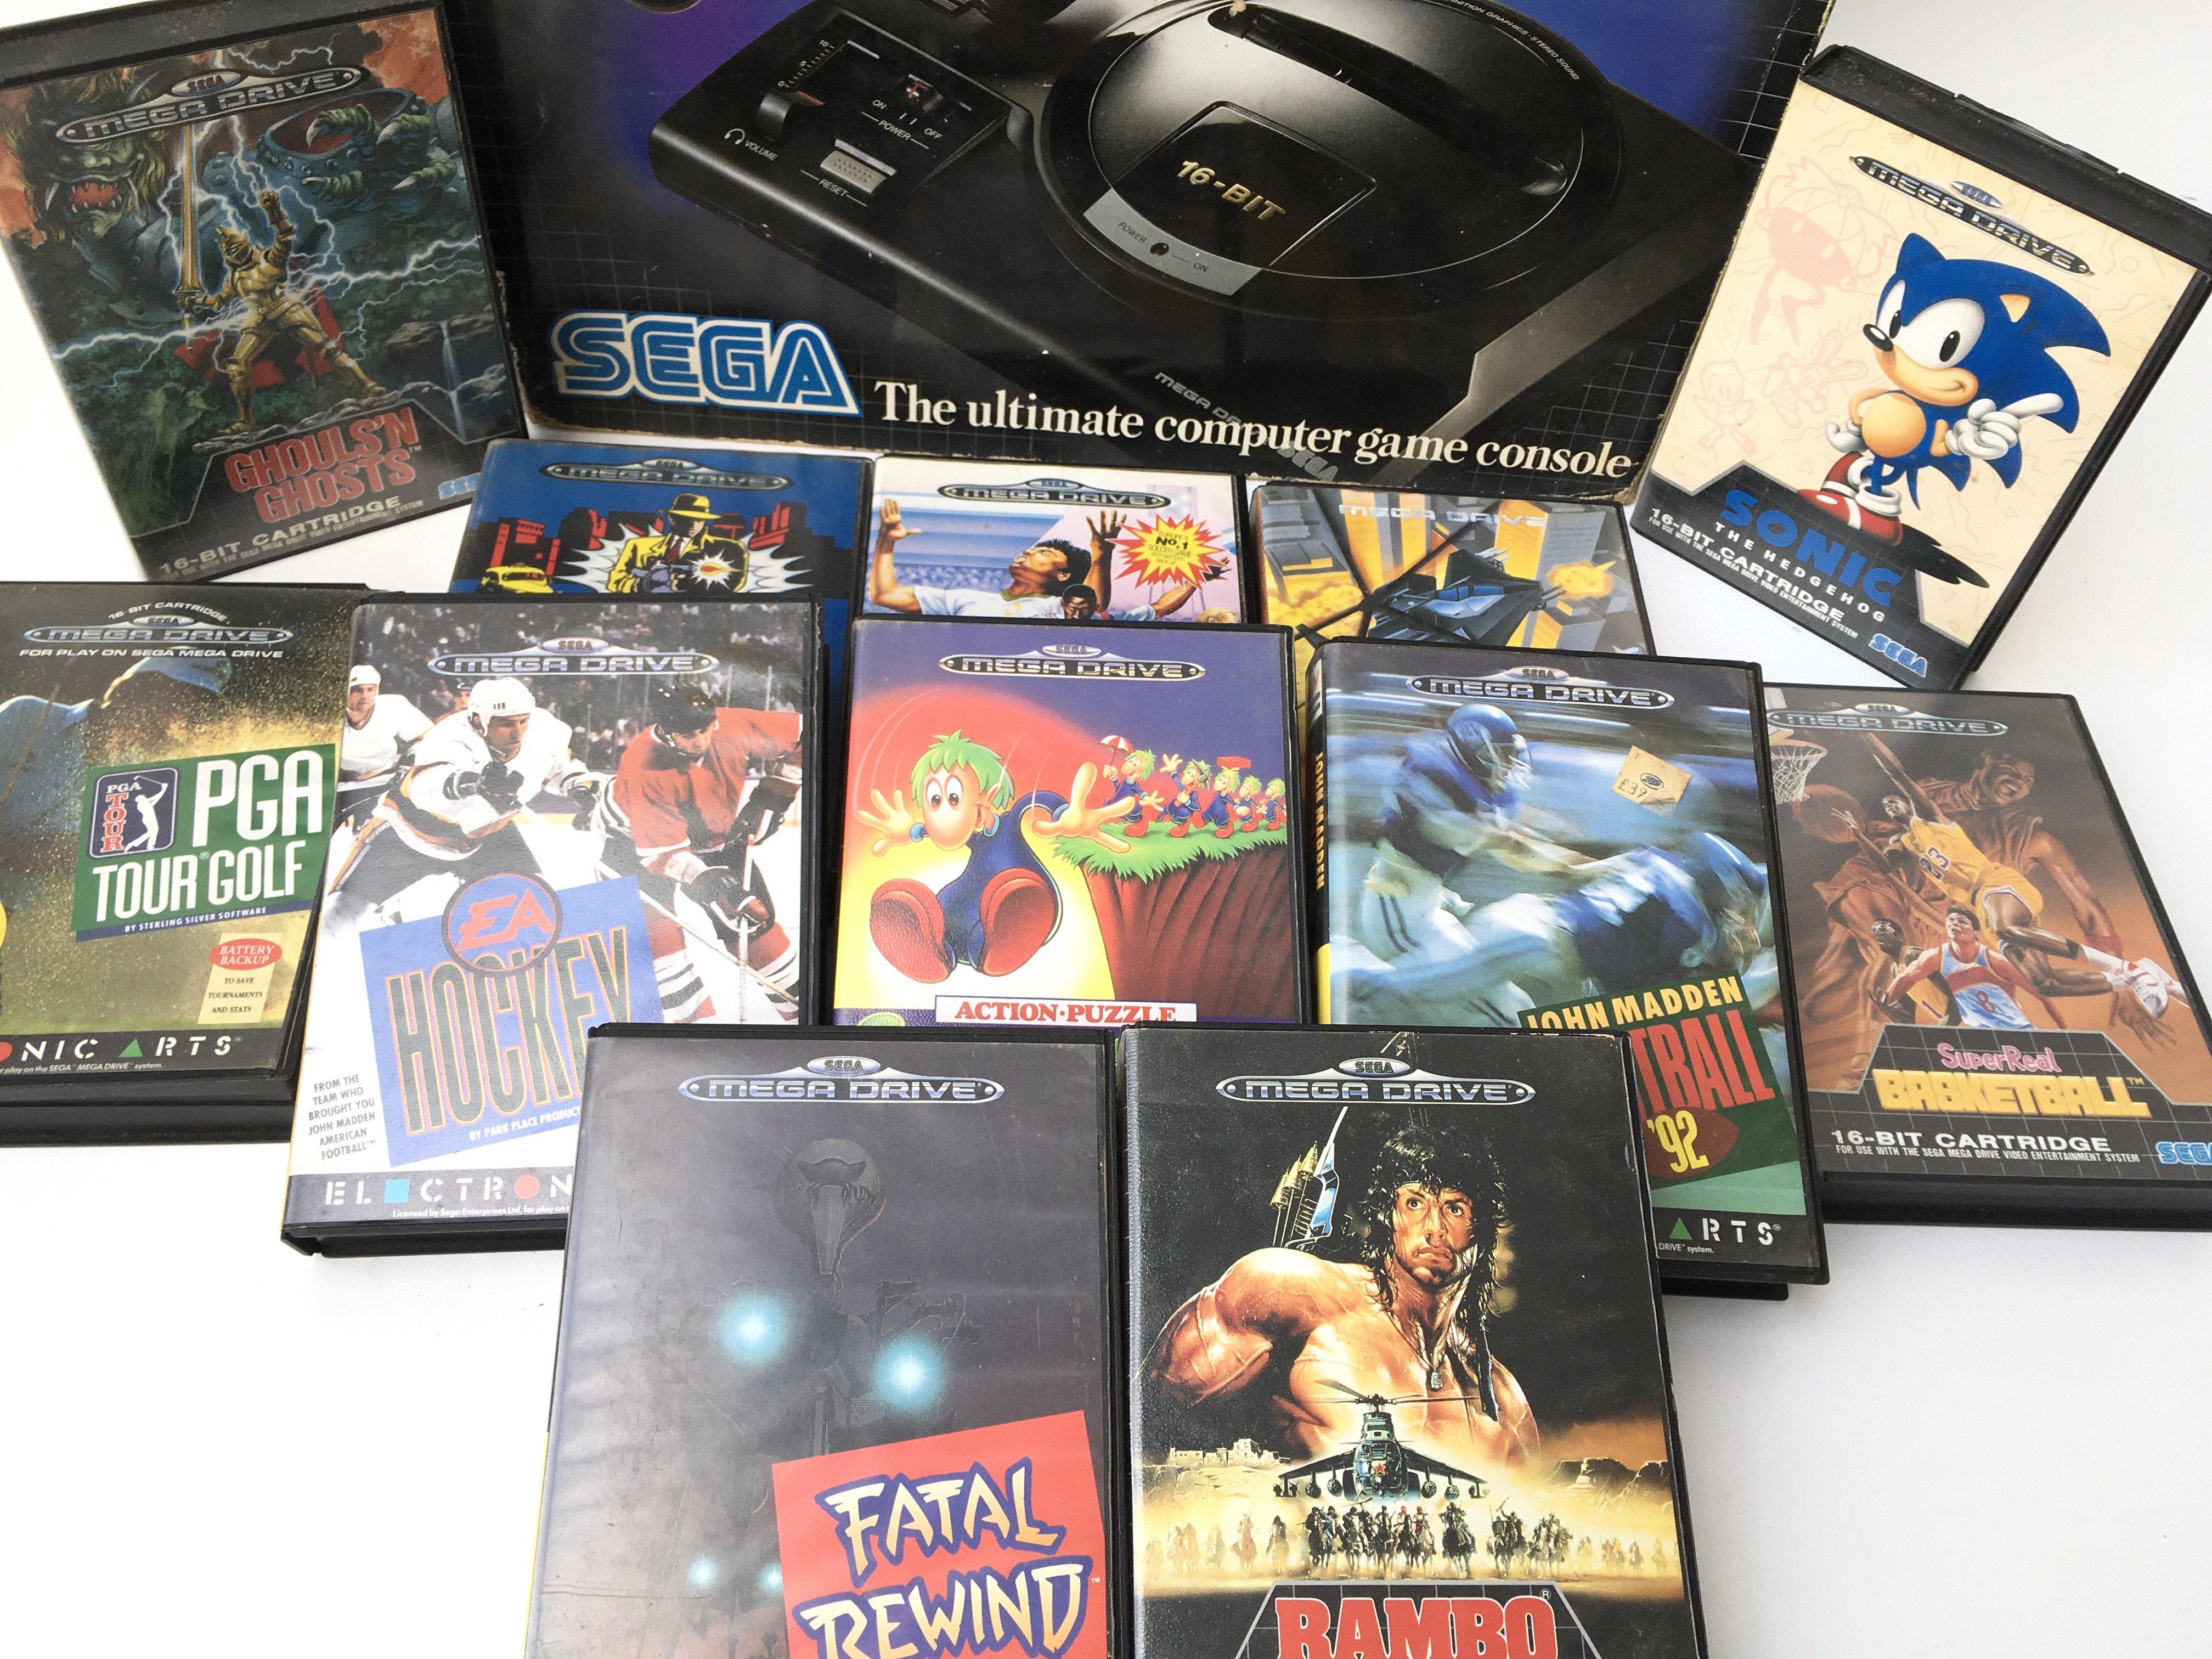 A Boxed Sega Mega Drive with games. - Image 2 of 2